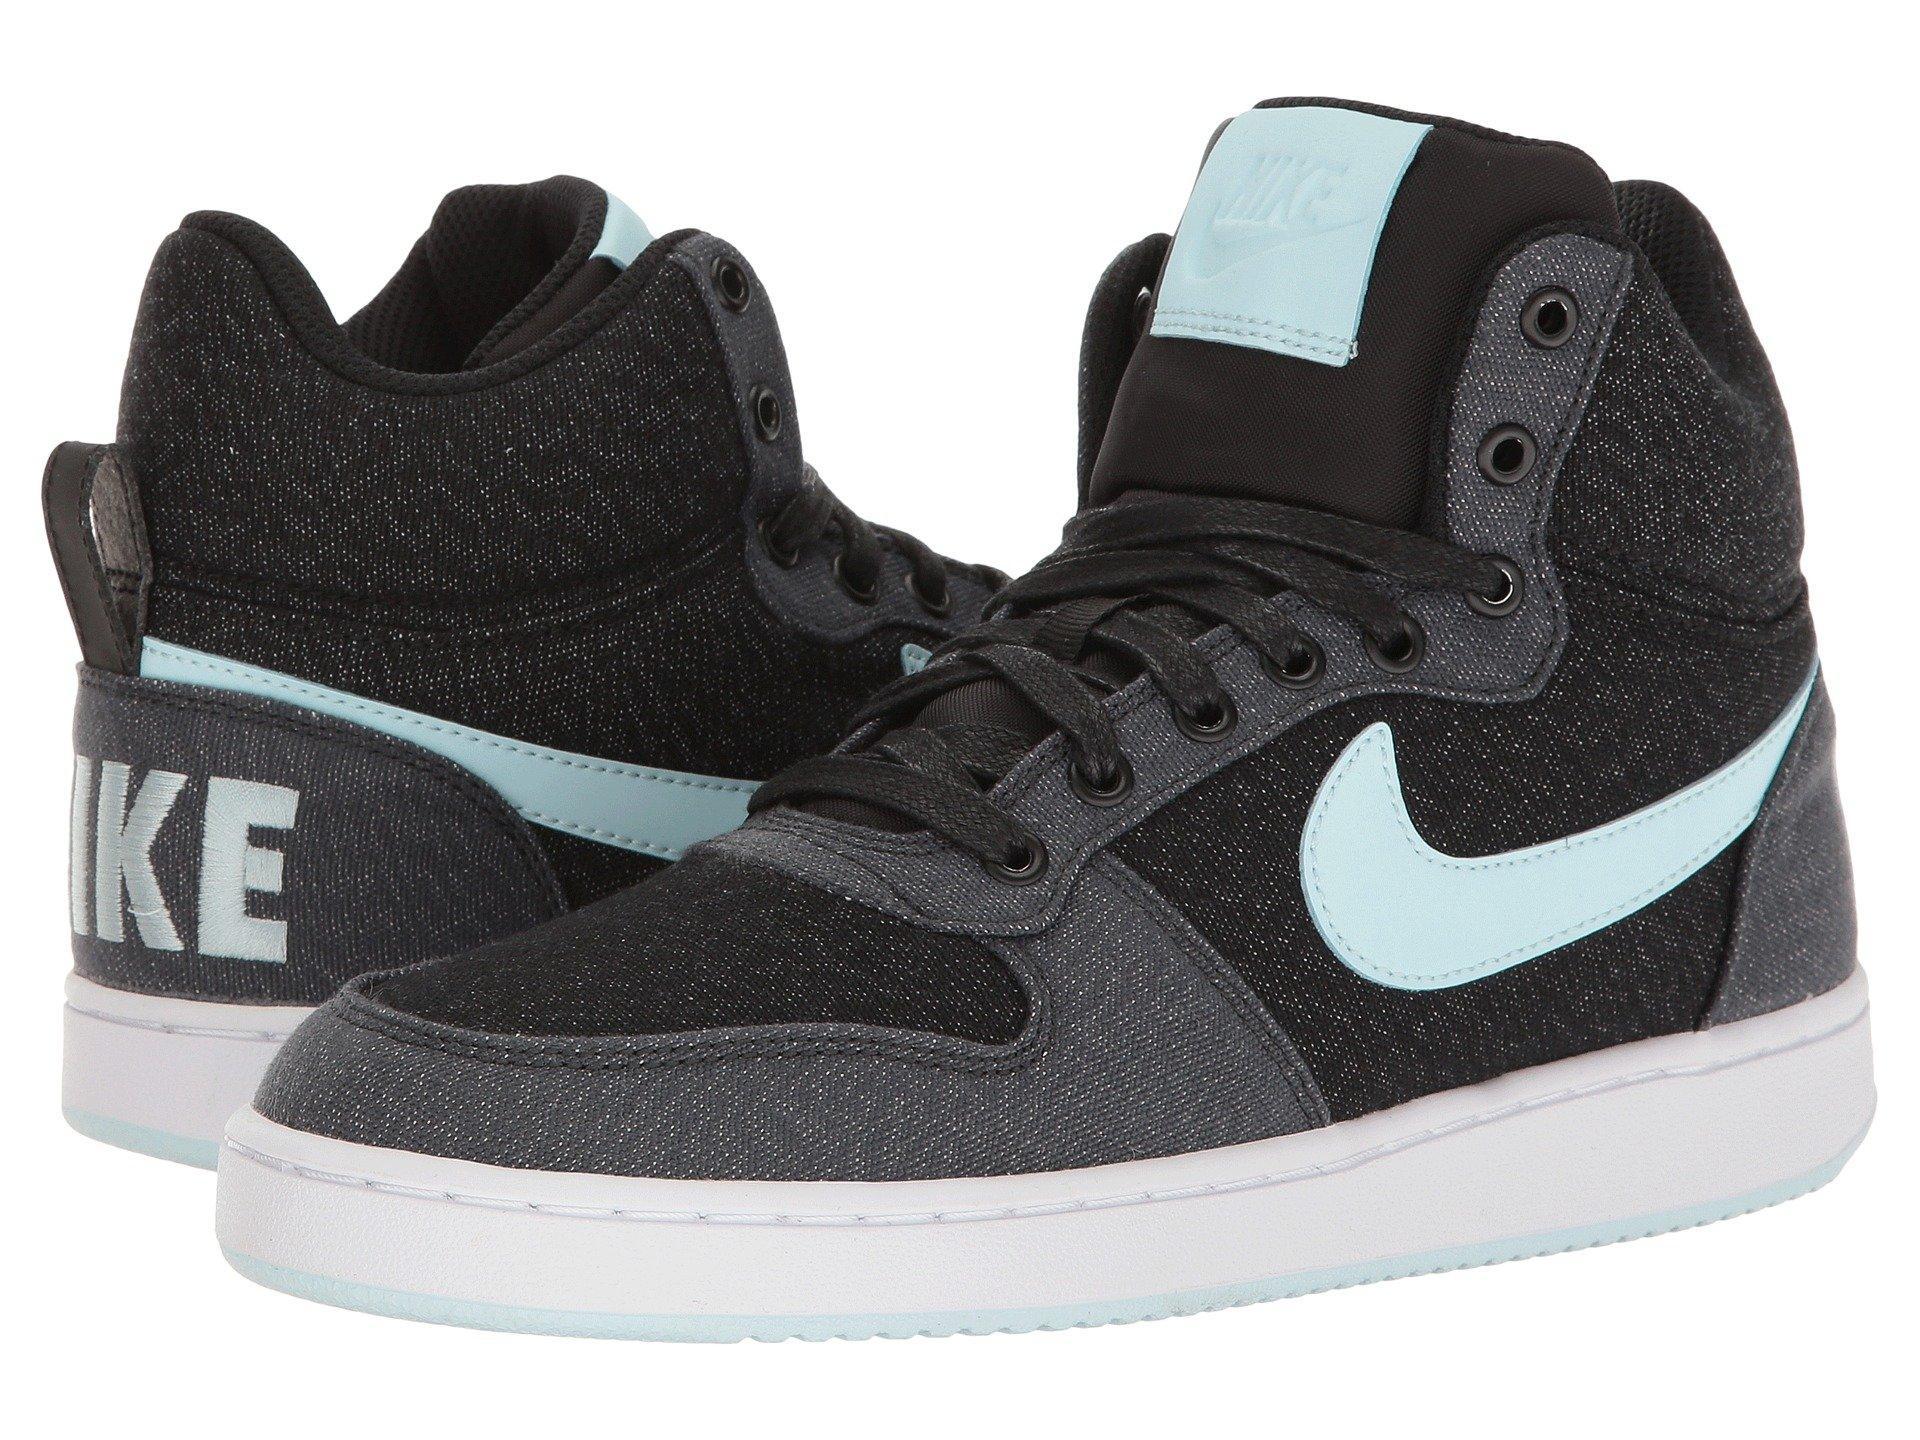 Nike RECREATION MID TOP PREMIUM SHOE |